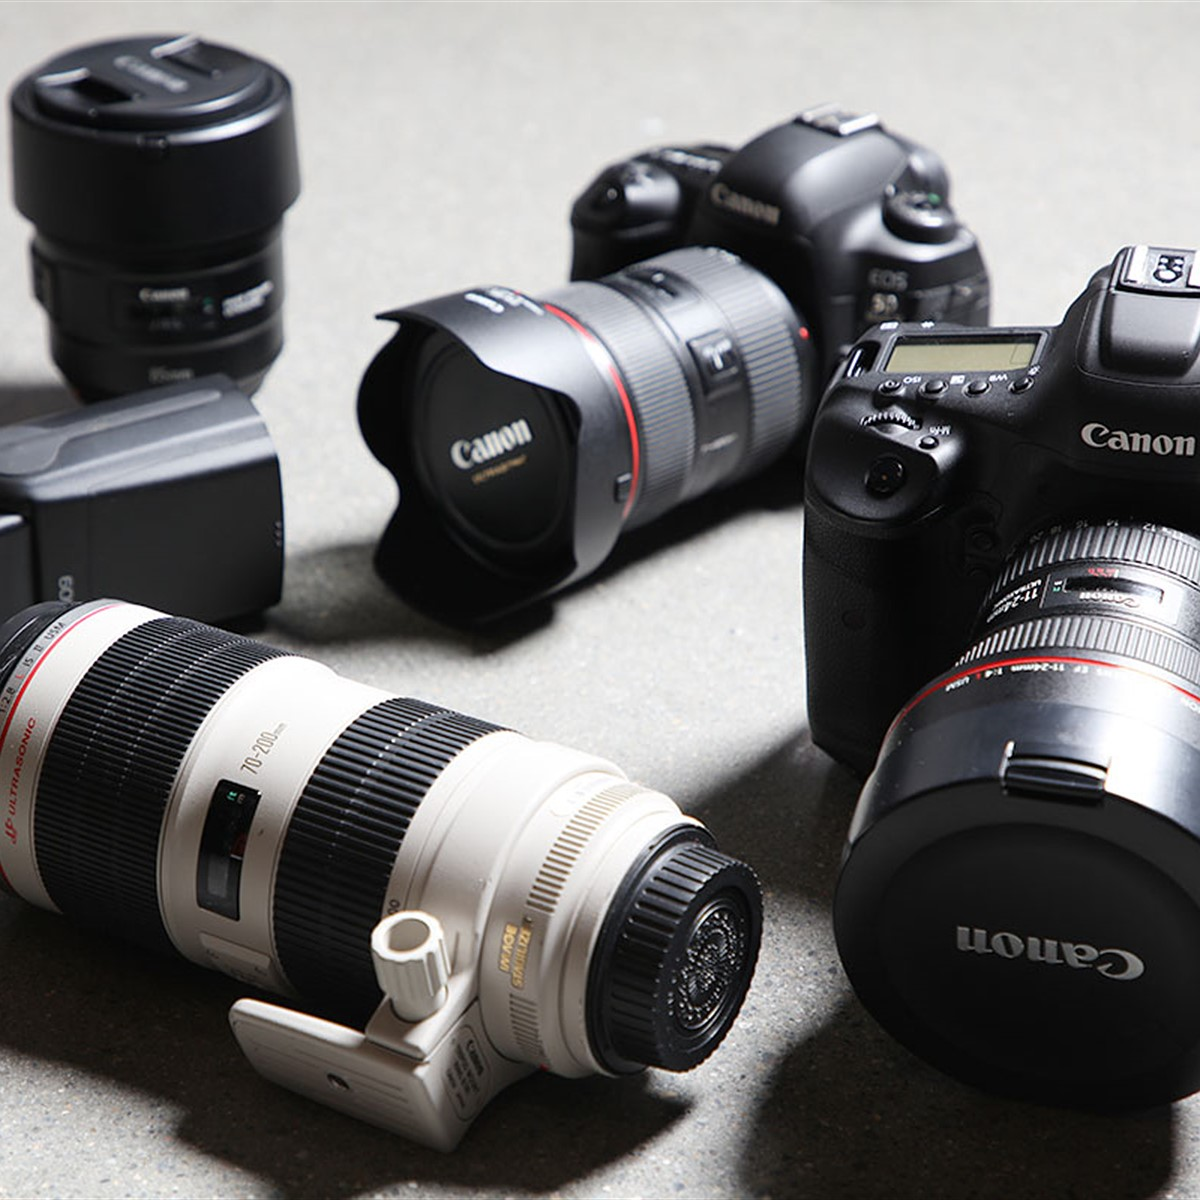 Genuine Pro Are Y Worth Digital Photography Review Precision Camera Repair Reviews Precision Camera Repair Ago dpreview Precision Camera Repair